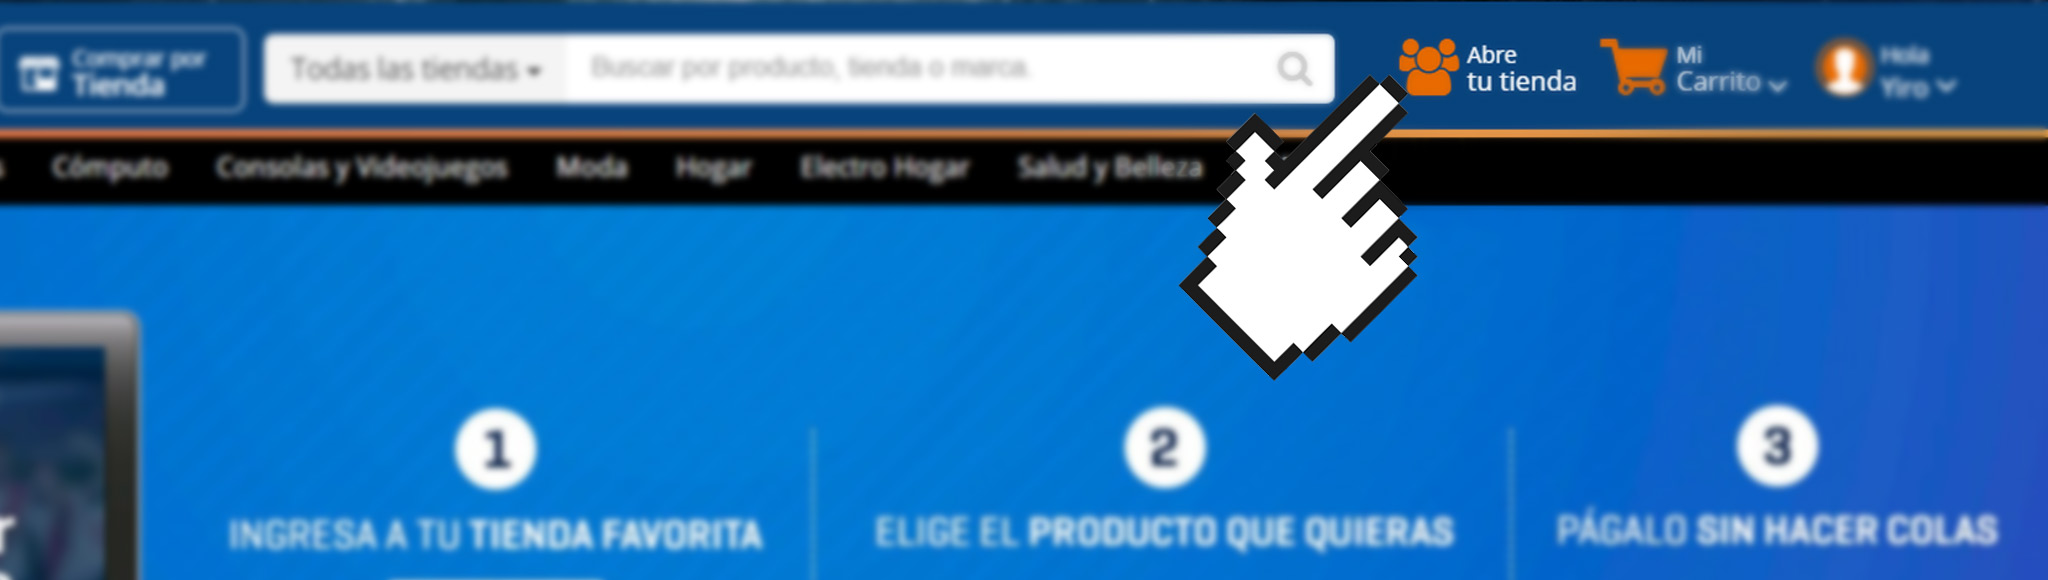 blog-tienda-online-1